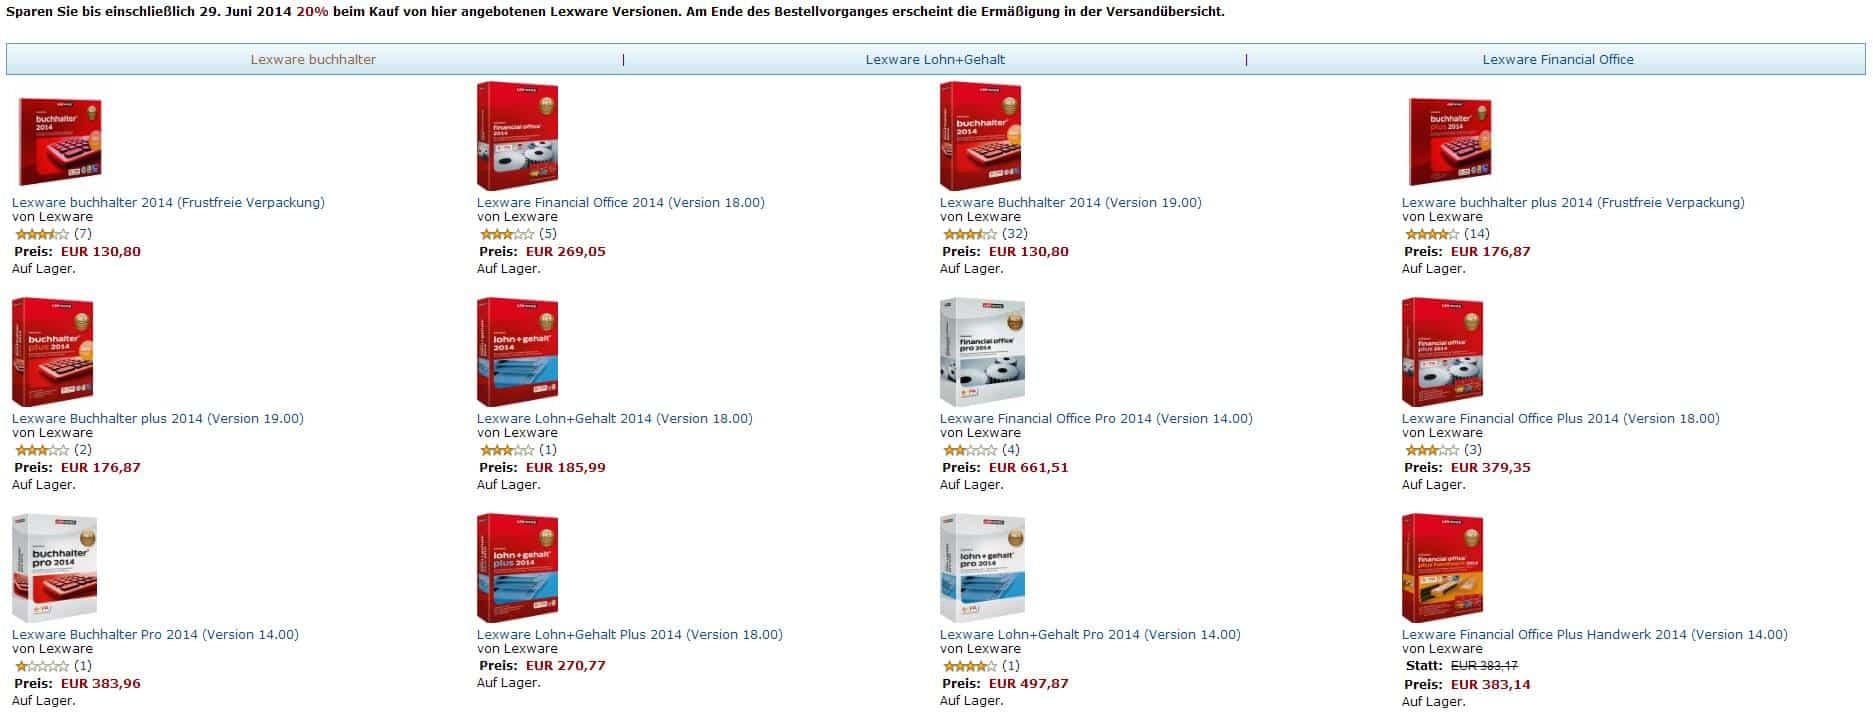 20 Prozent Aktion Amazon bis 29.06.2014